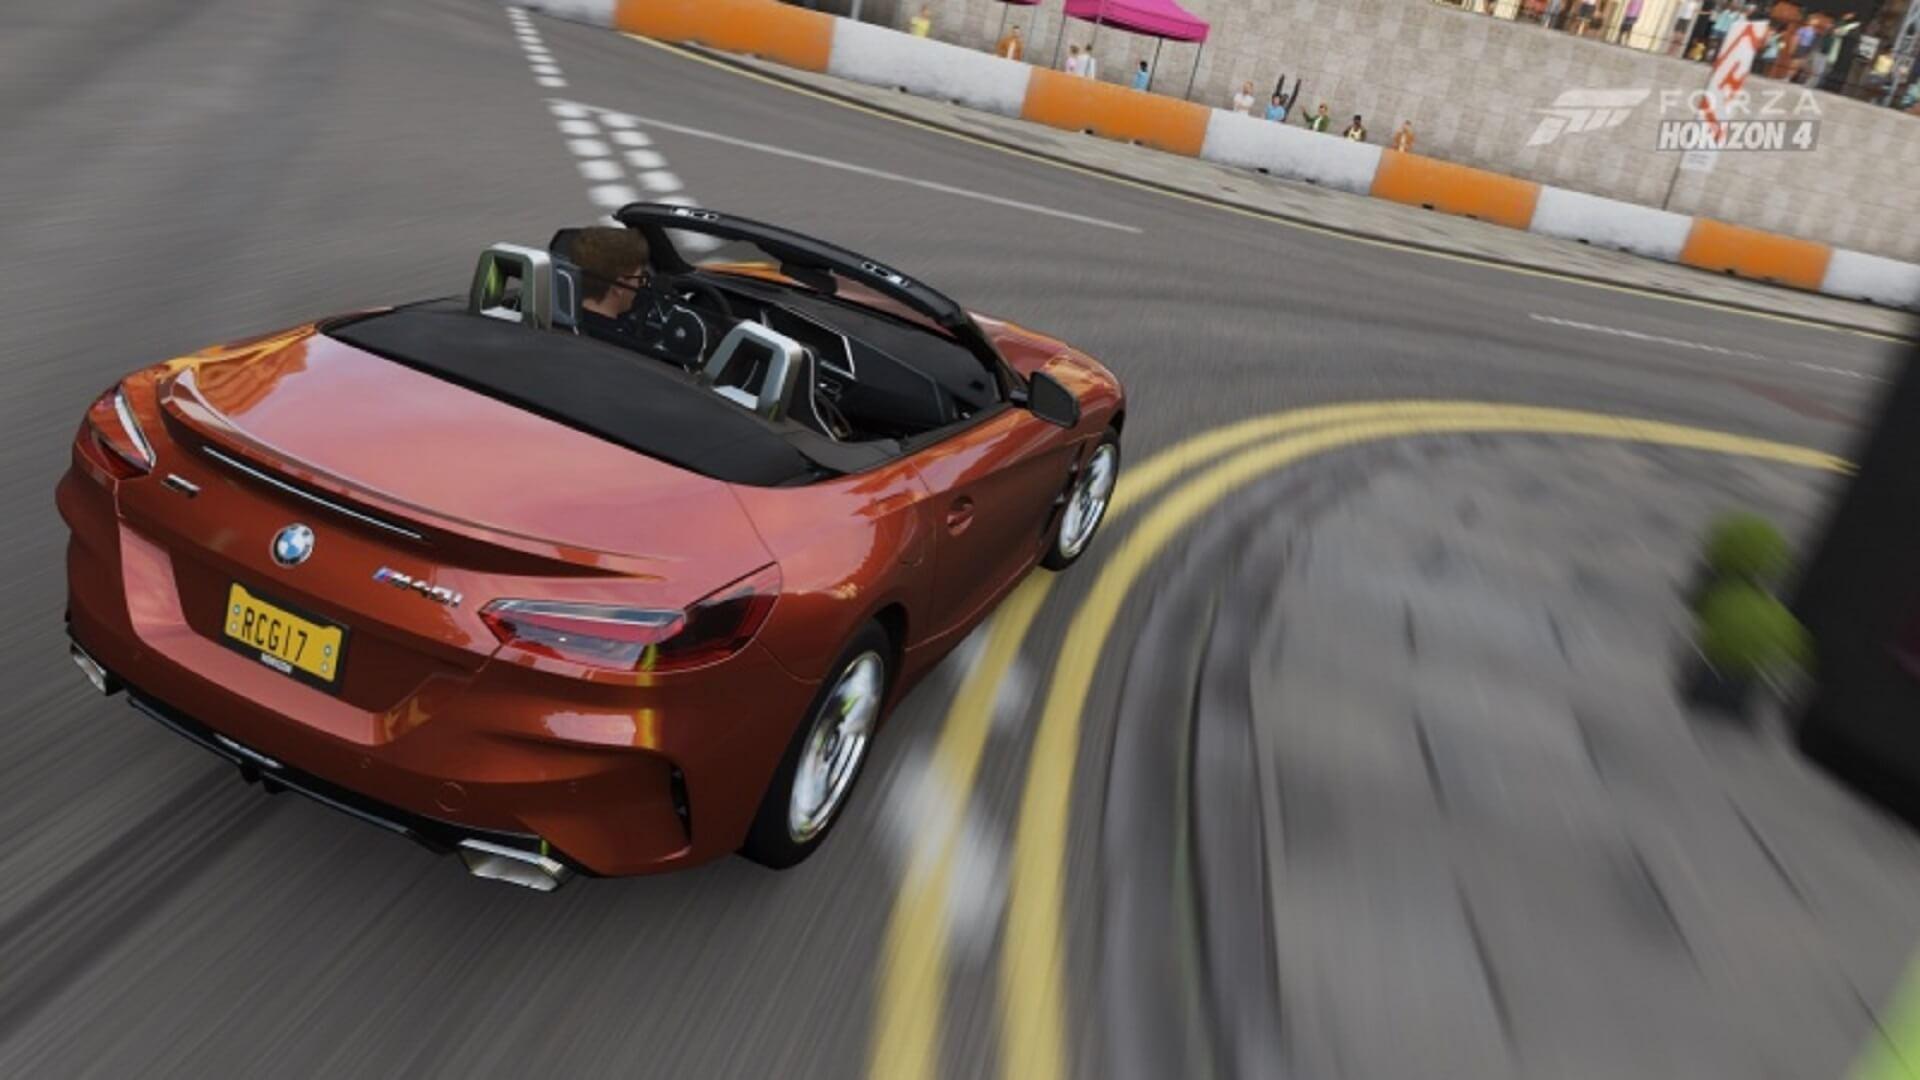 This Week's Forza Horizon 4 Season Change: A Very German Spring